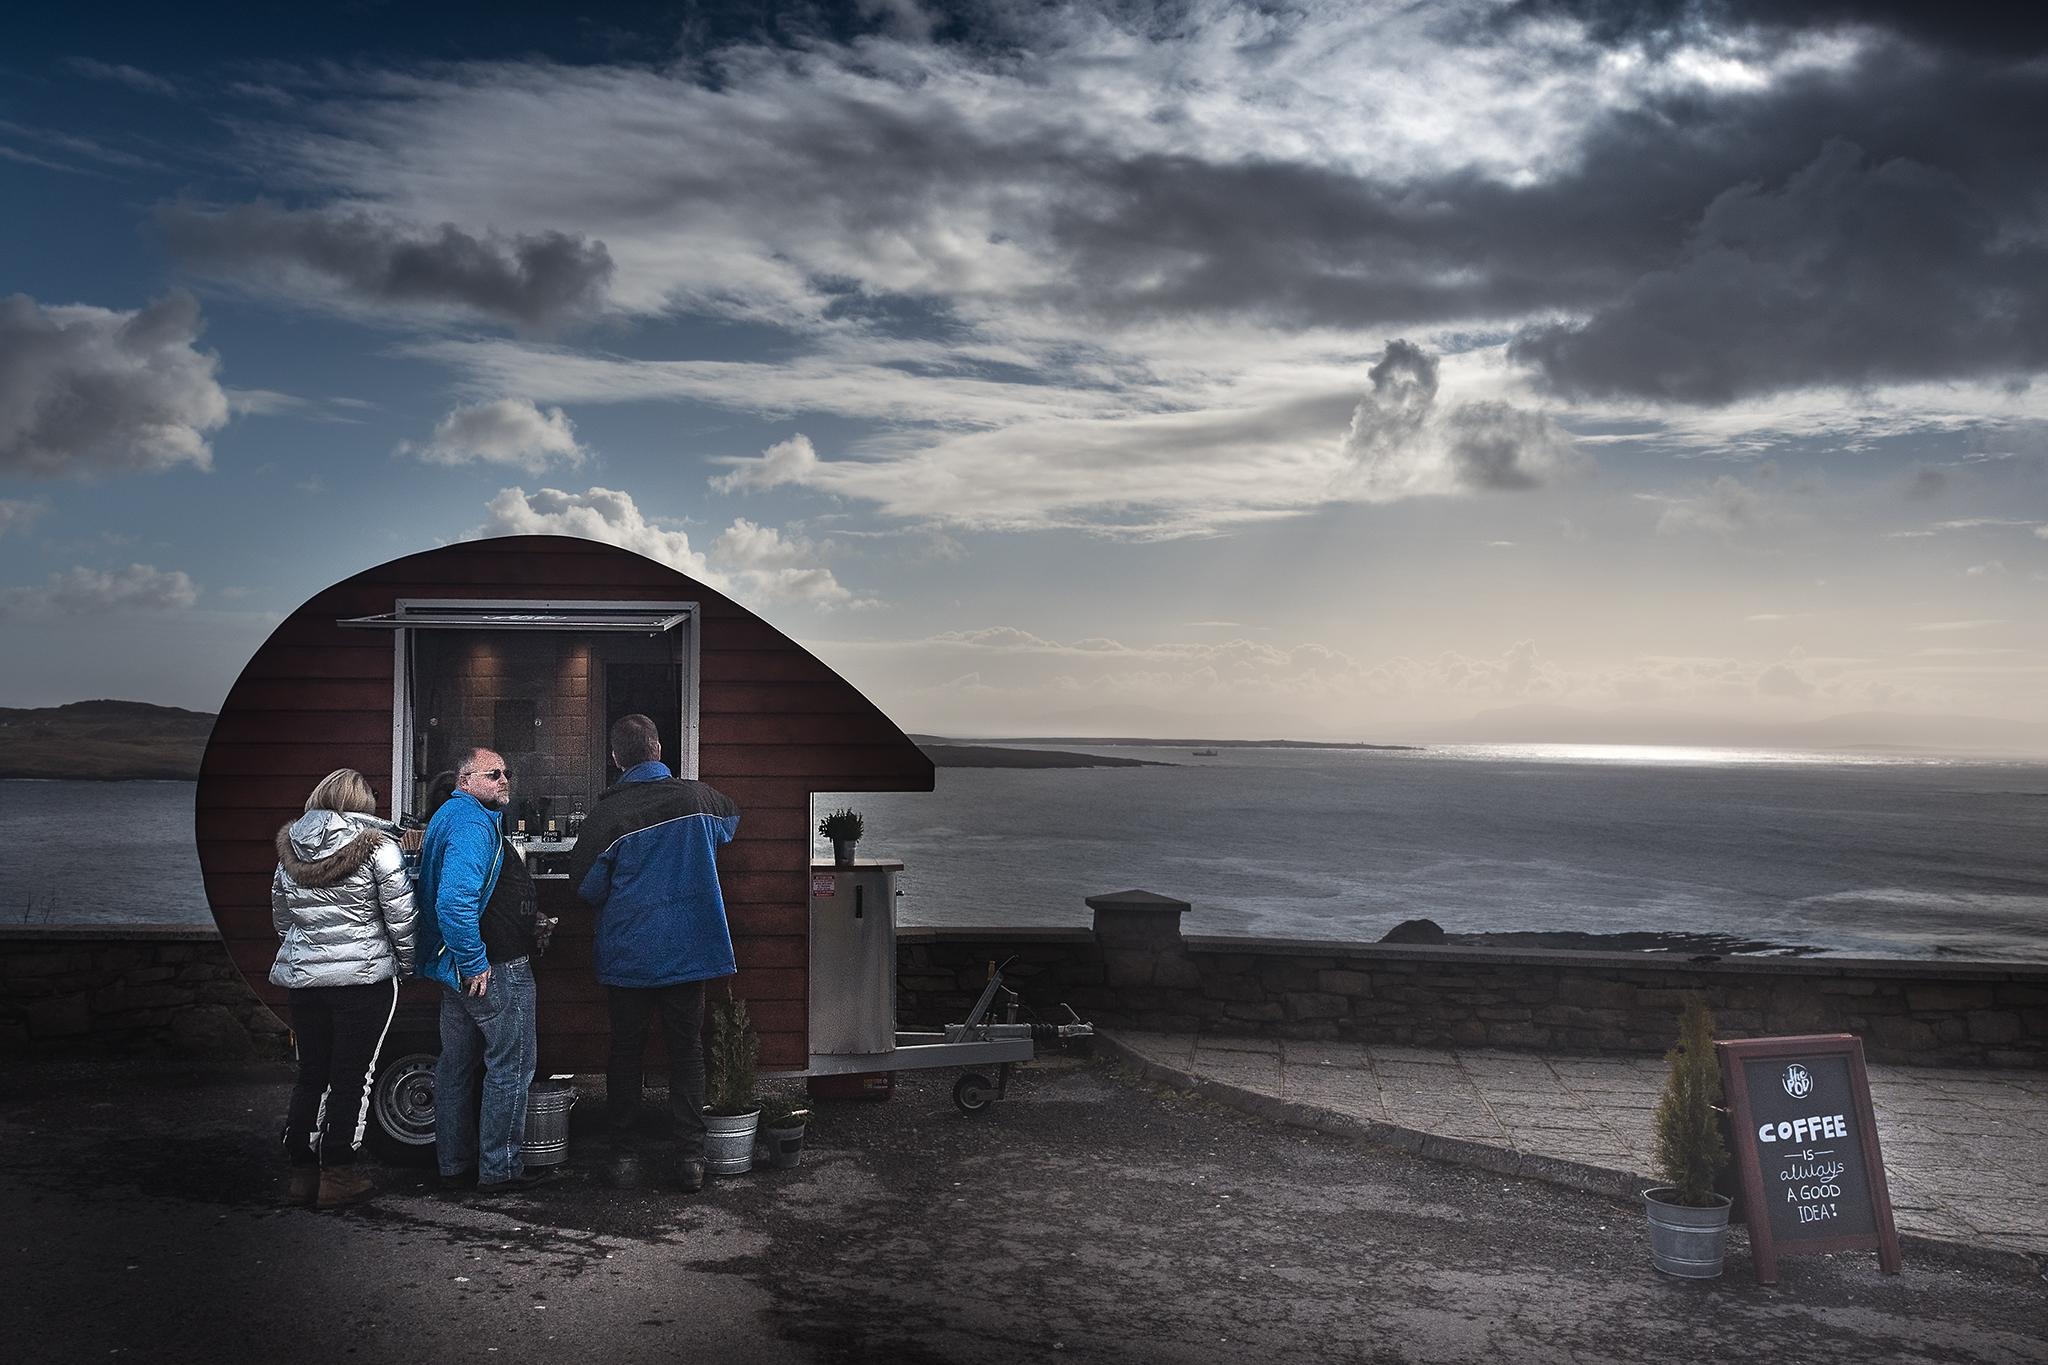 Irland_LIK_Landschaftsfotografie